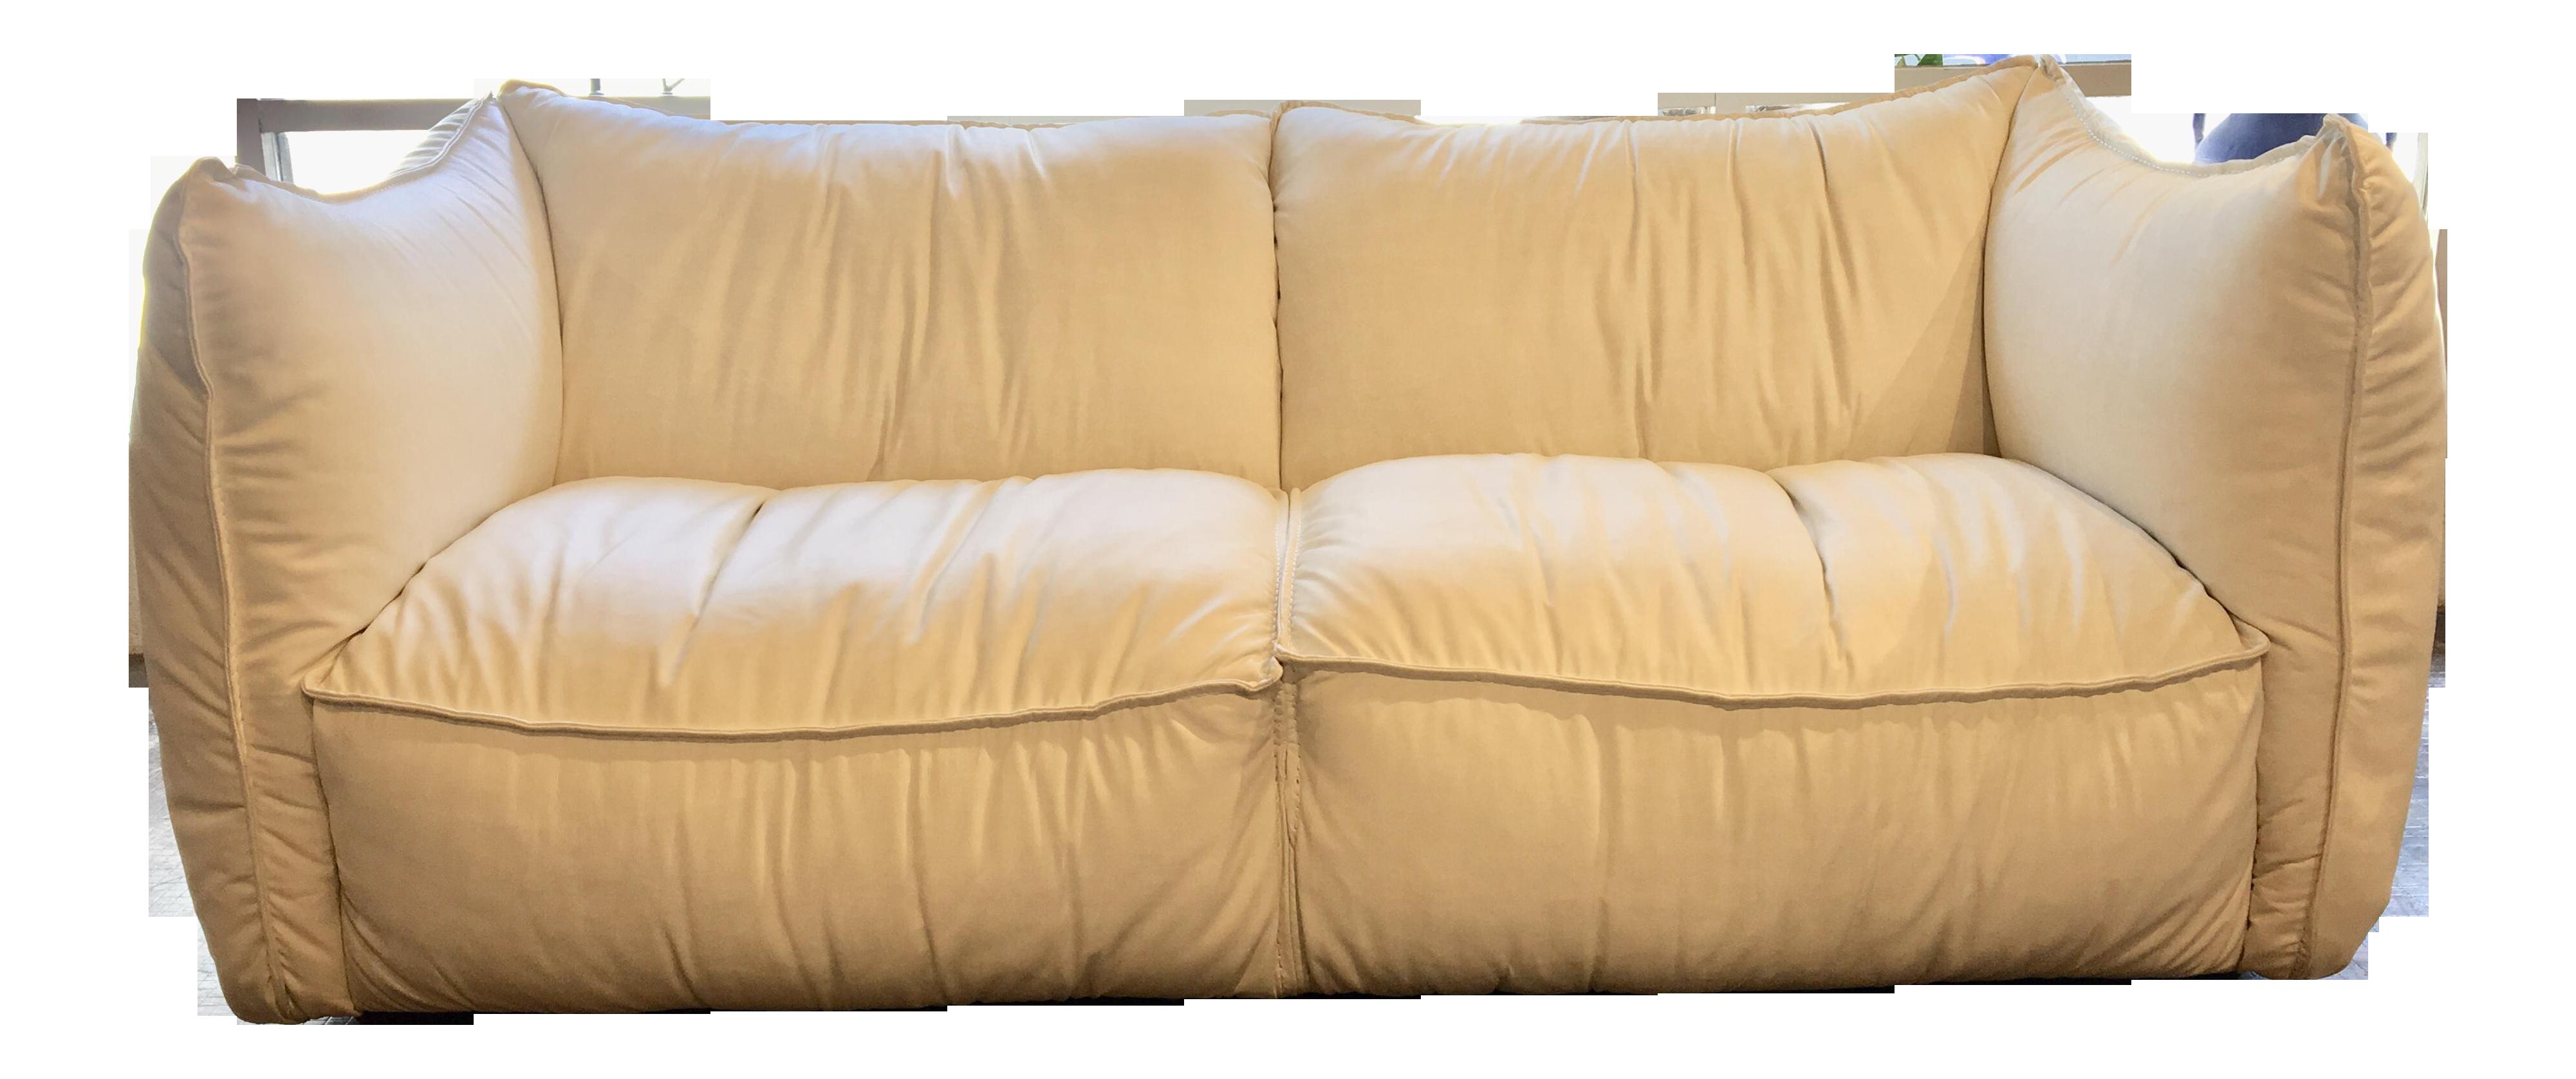 Contemporary Eleanor Rigby White Leather Sofa